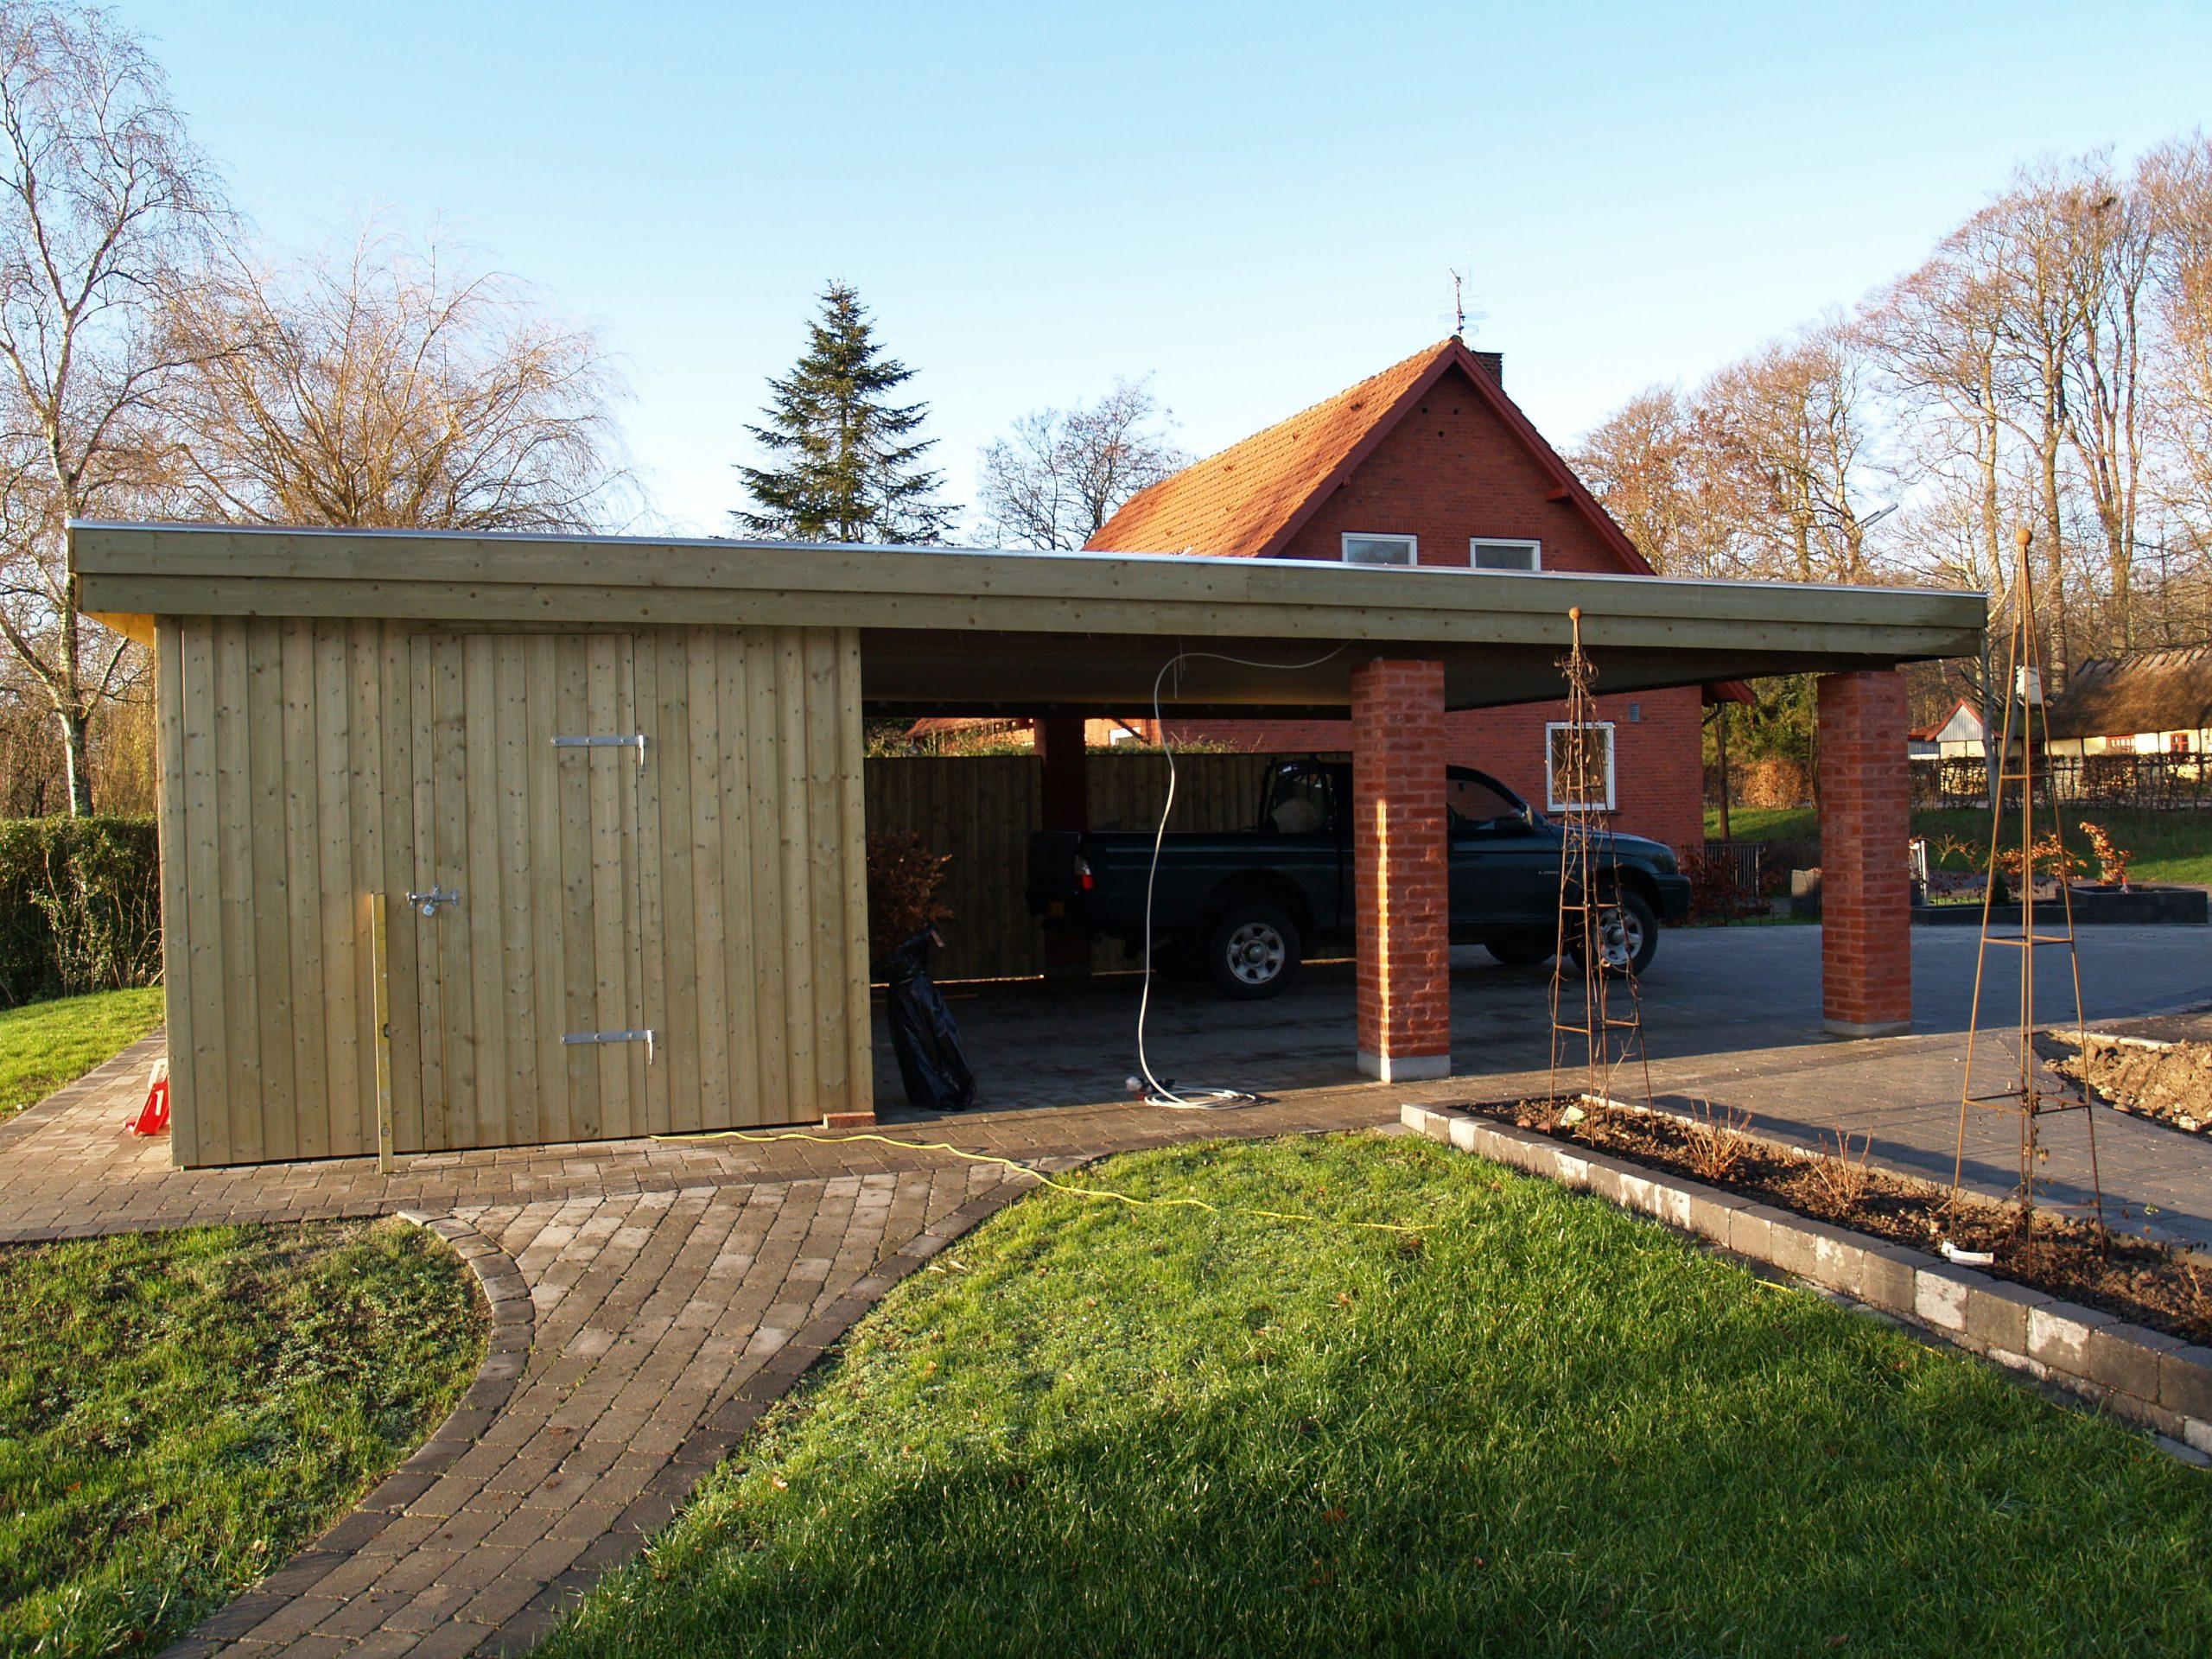 Selv garage priser byg Carporte og